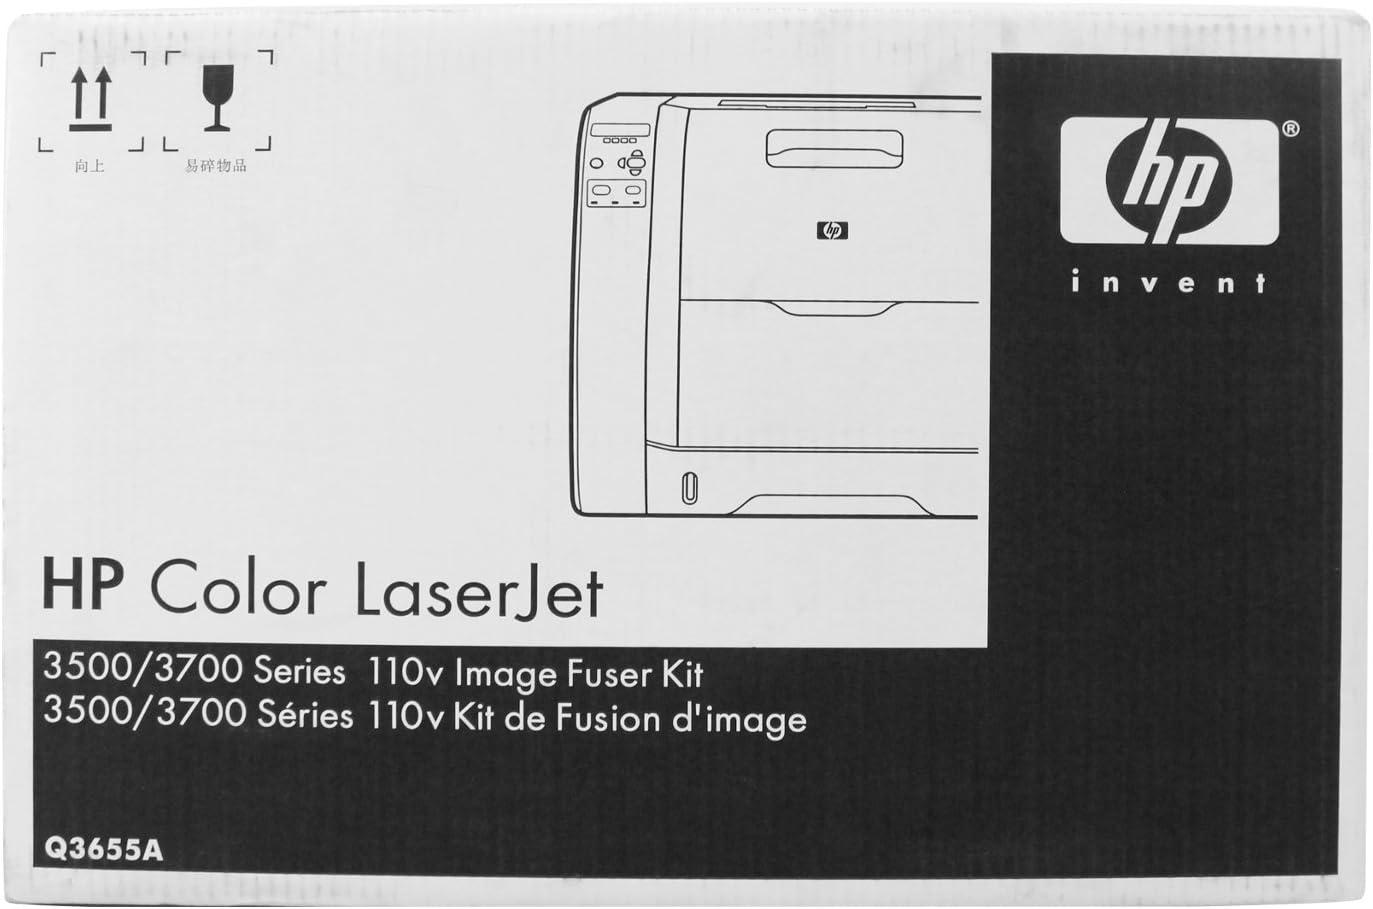 HP Fuser Kit (Q3655A)